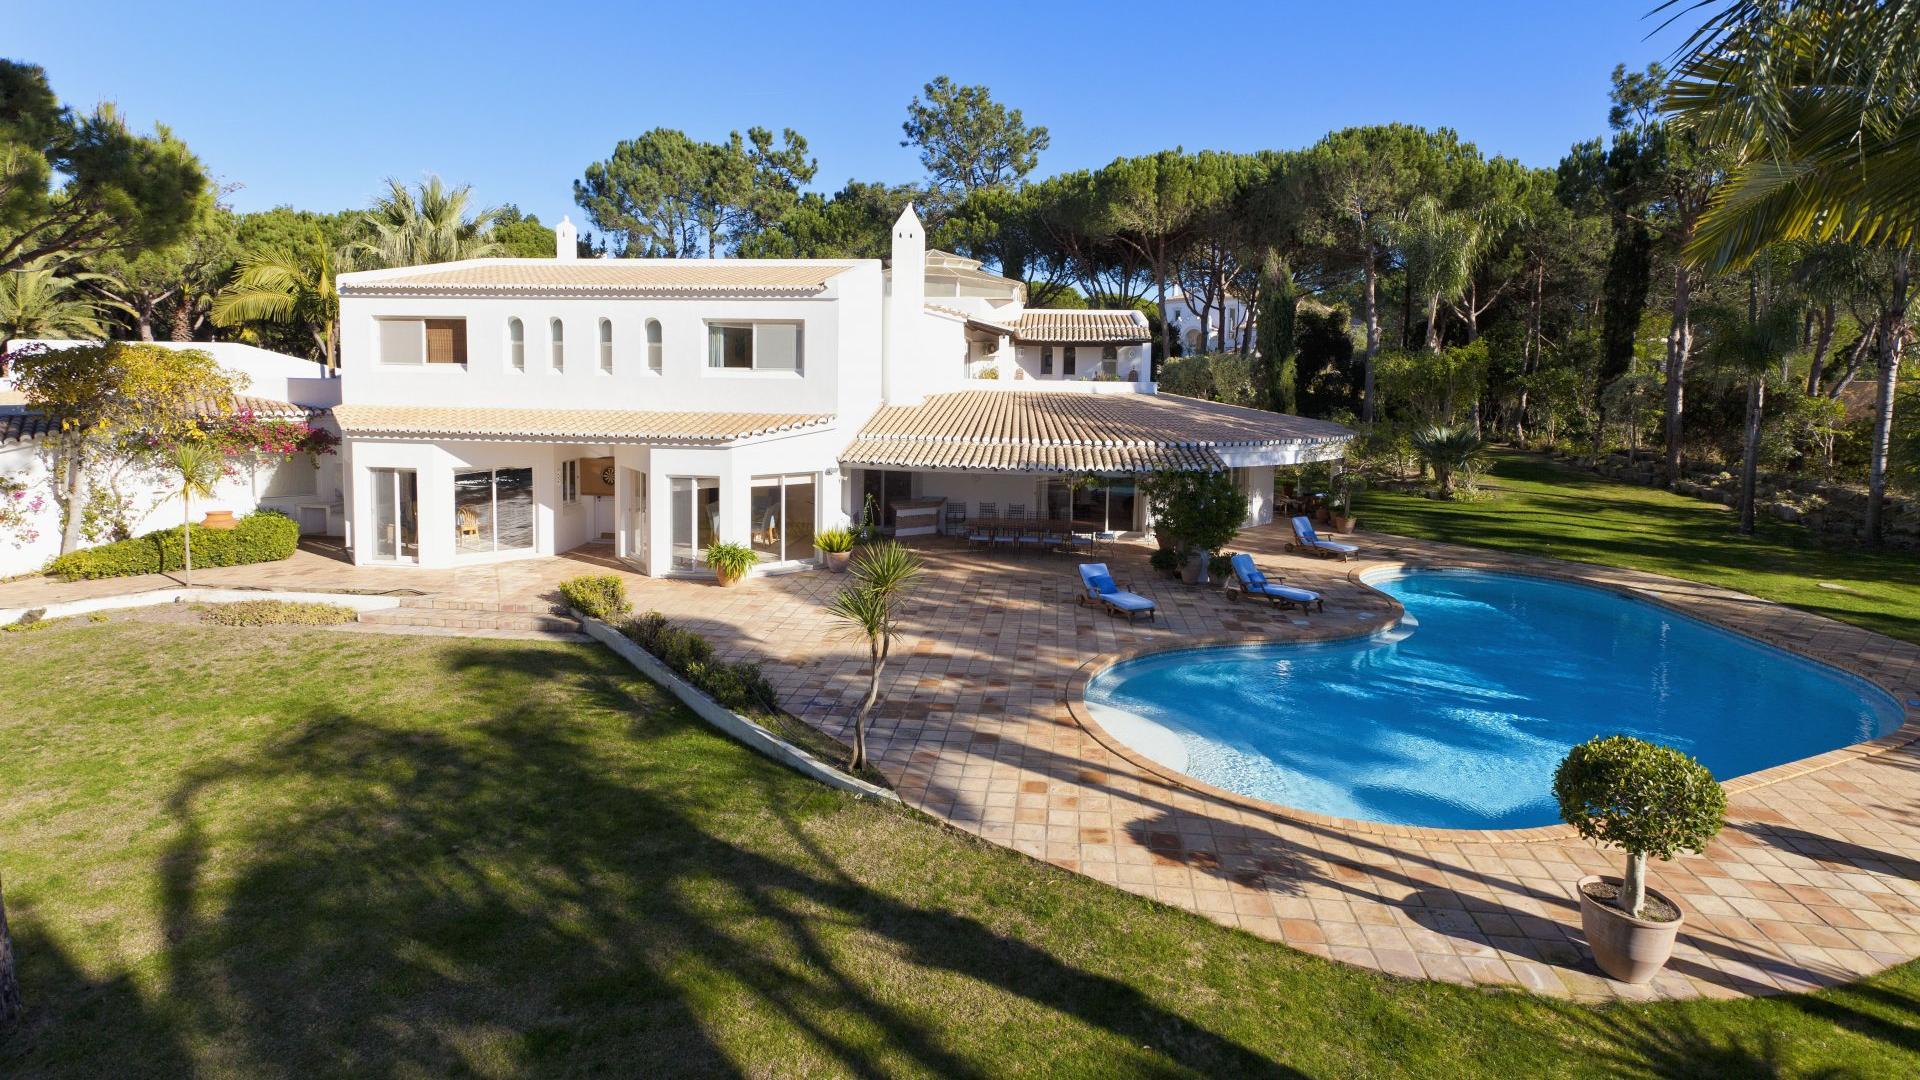 Villa Figueira - Quinta do Lago, Algarve - IMG_9742.jpg